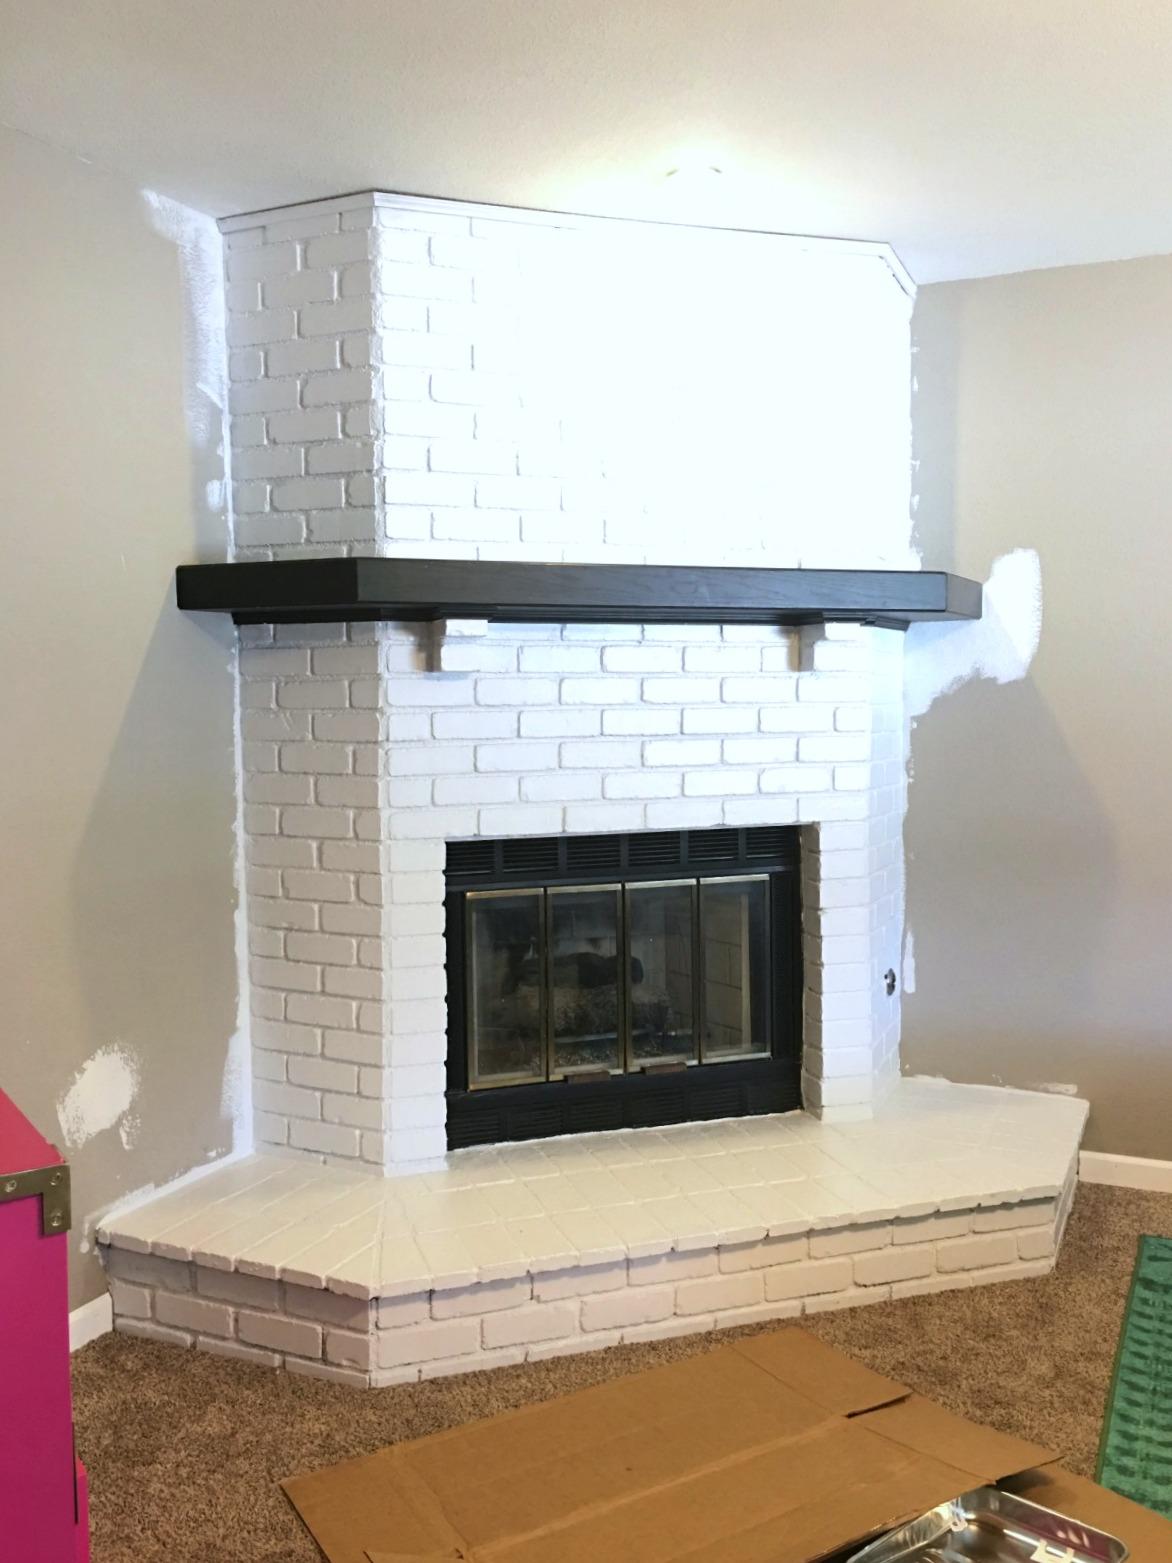 Prescott View Home Reno Fireplace Remodel